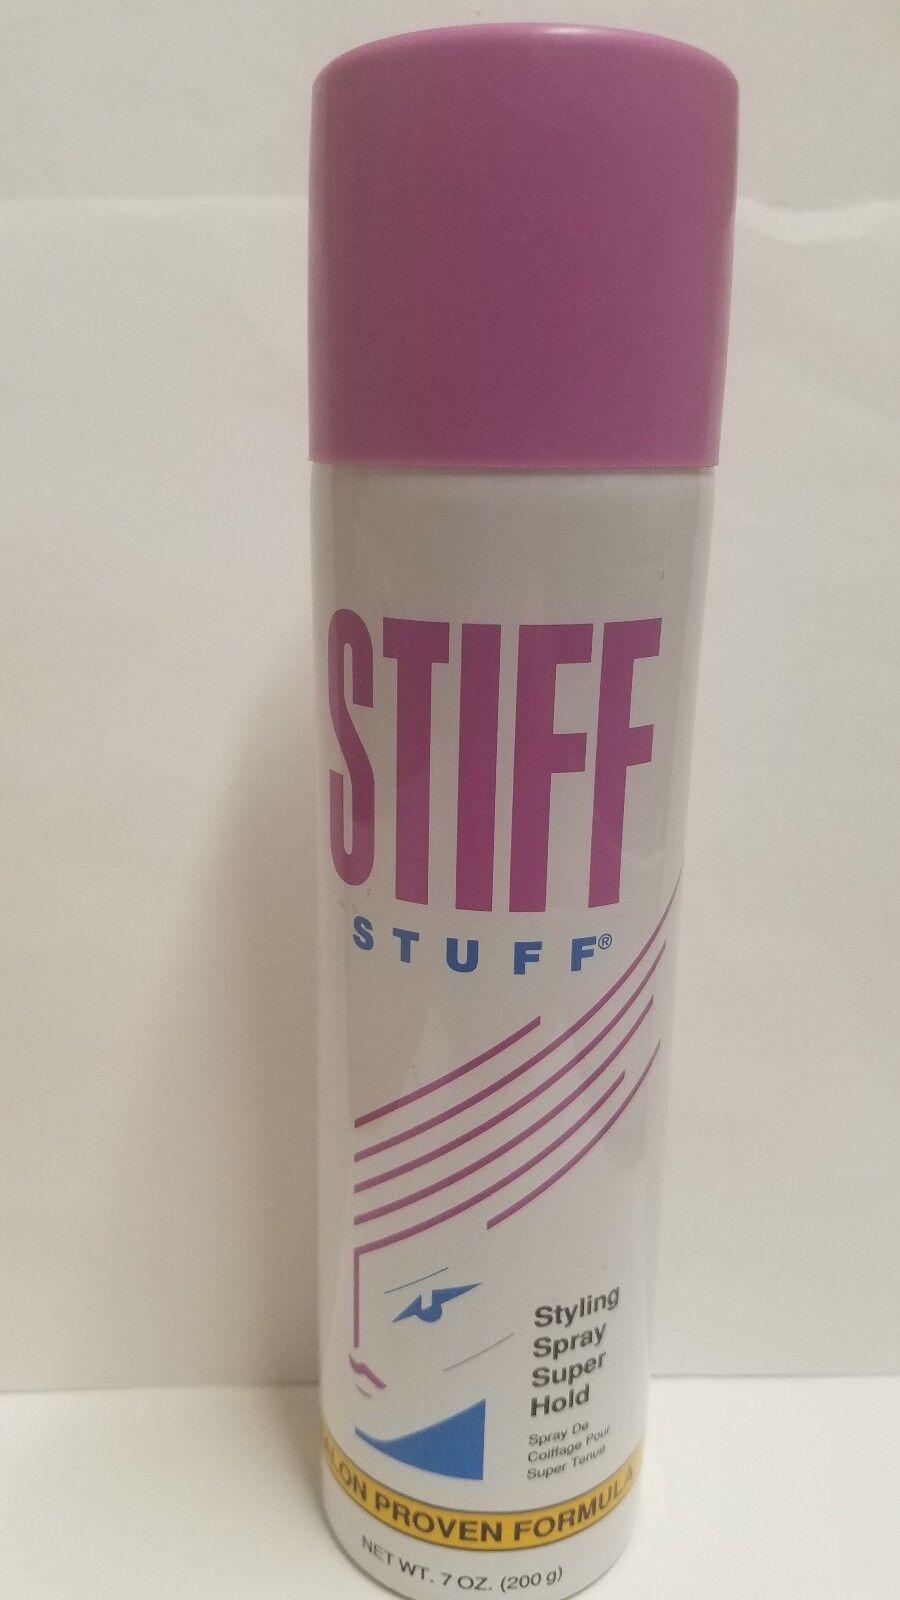 Stiff Stuff Vintage Styling Spray Super Hold Salon Proven Formula 7